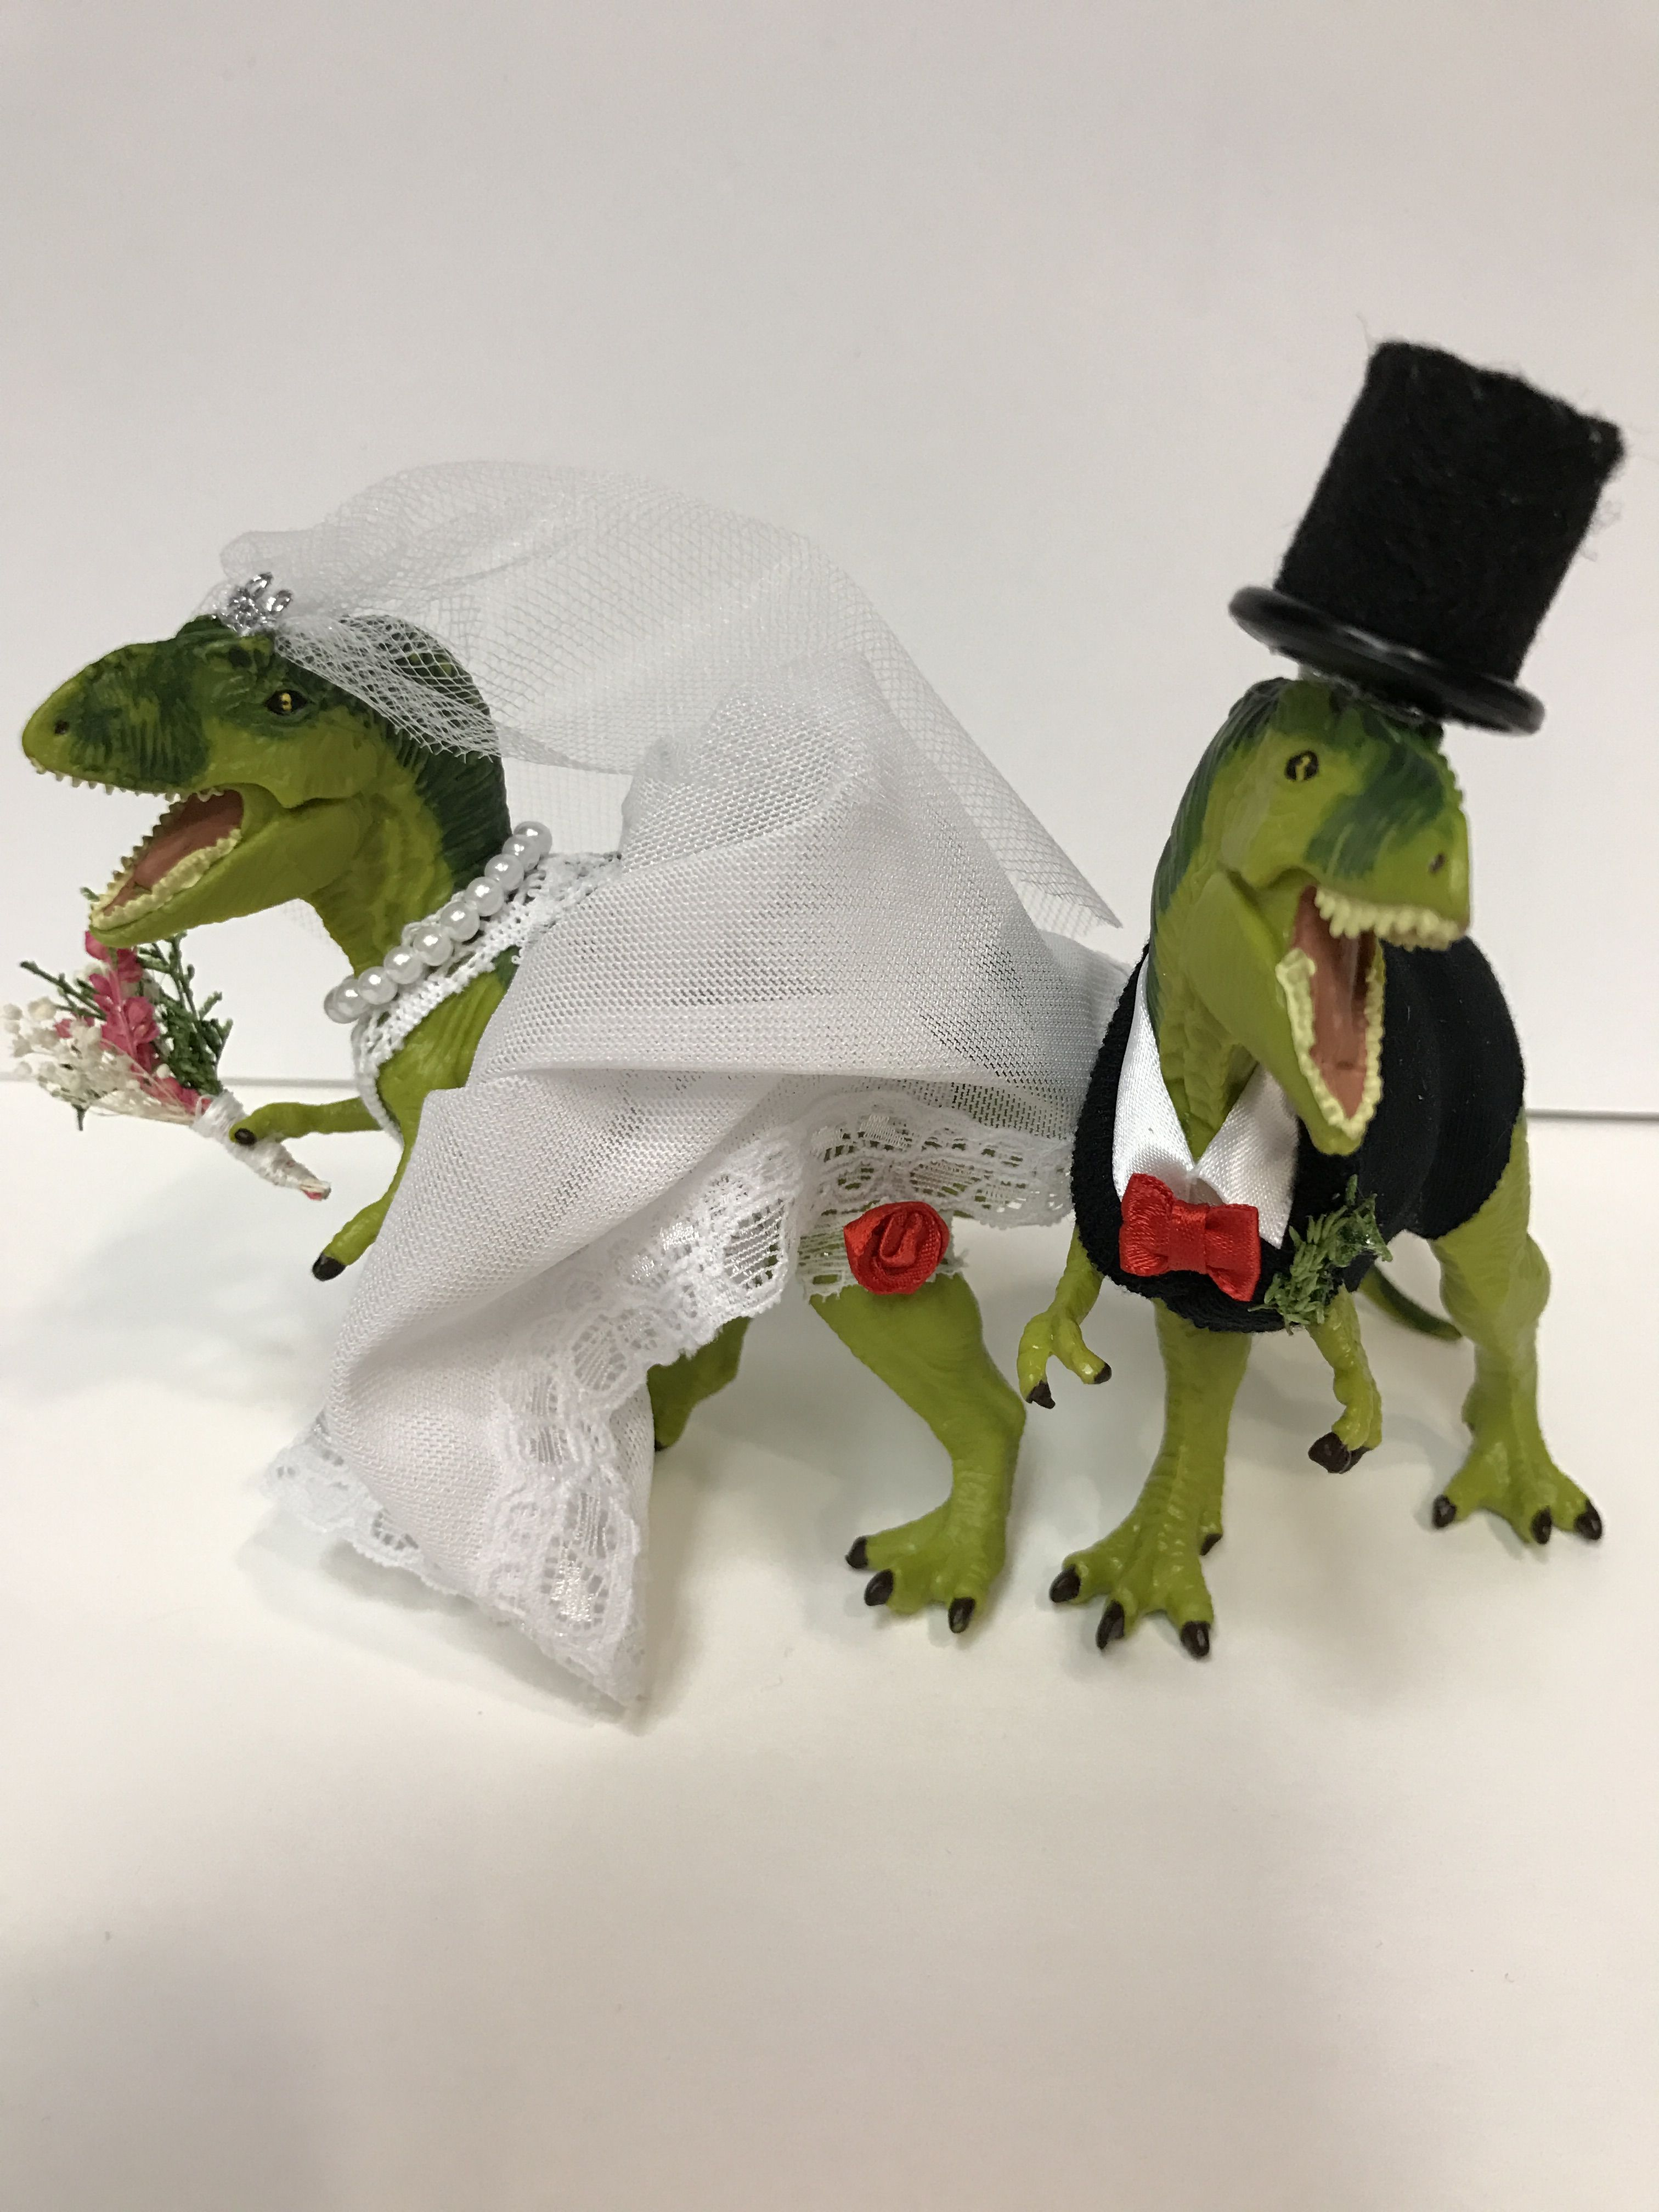 Dinosaur Wedding Dino Wedding Trex Wedding Trex Groom Trex Bride Dino Bride Dino Groom Wedding Cake Topp Animal Cake Topper Dinosaur Wedding Animal Cake